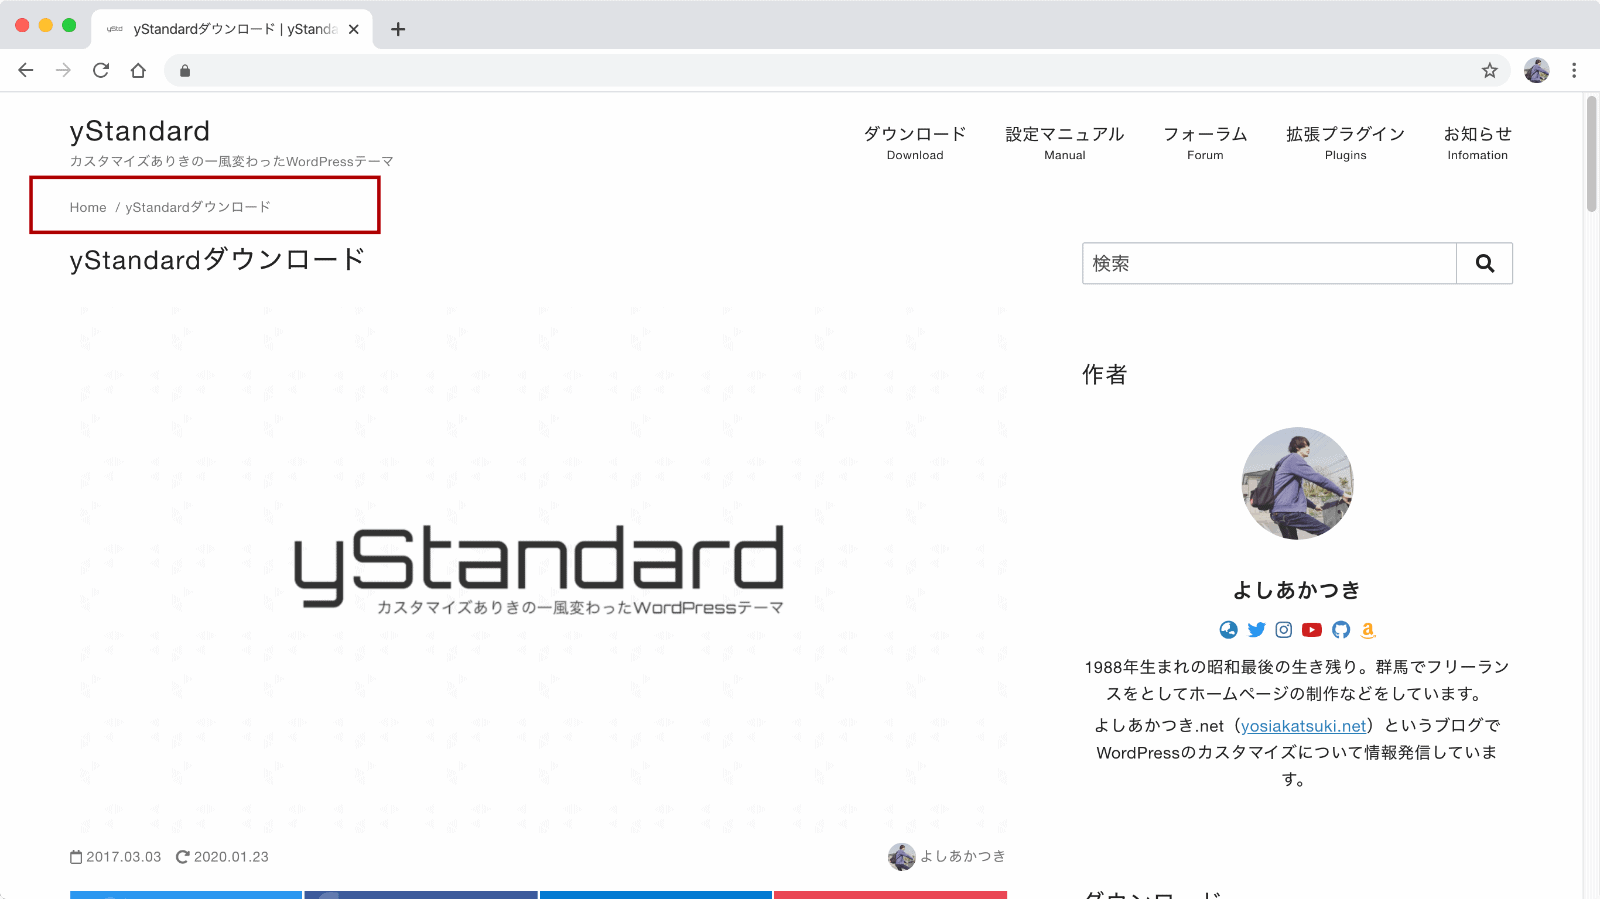 yStandardのパンくずリスト表示例:ヘッダー側